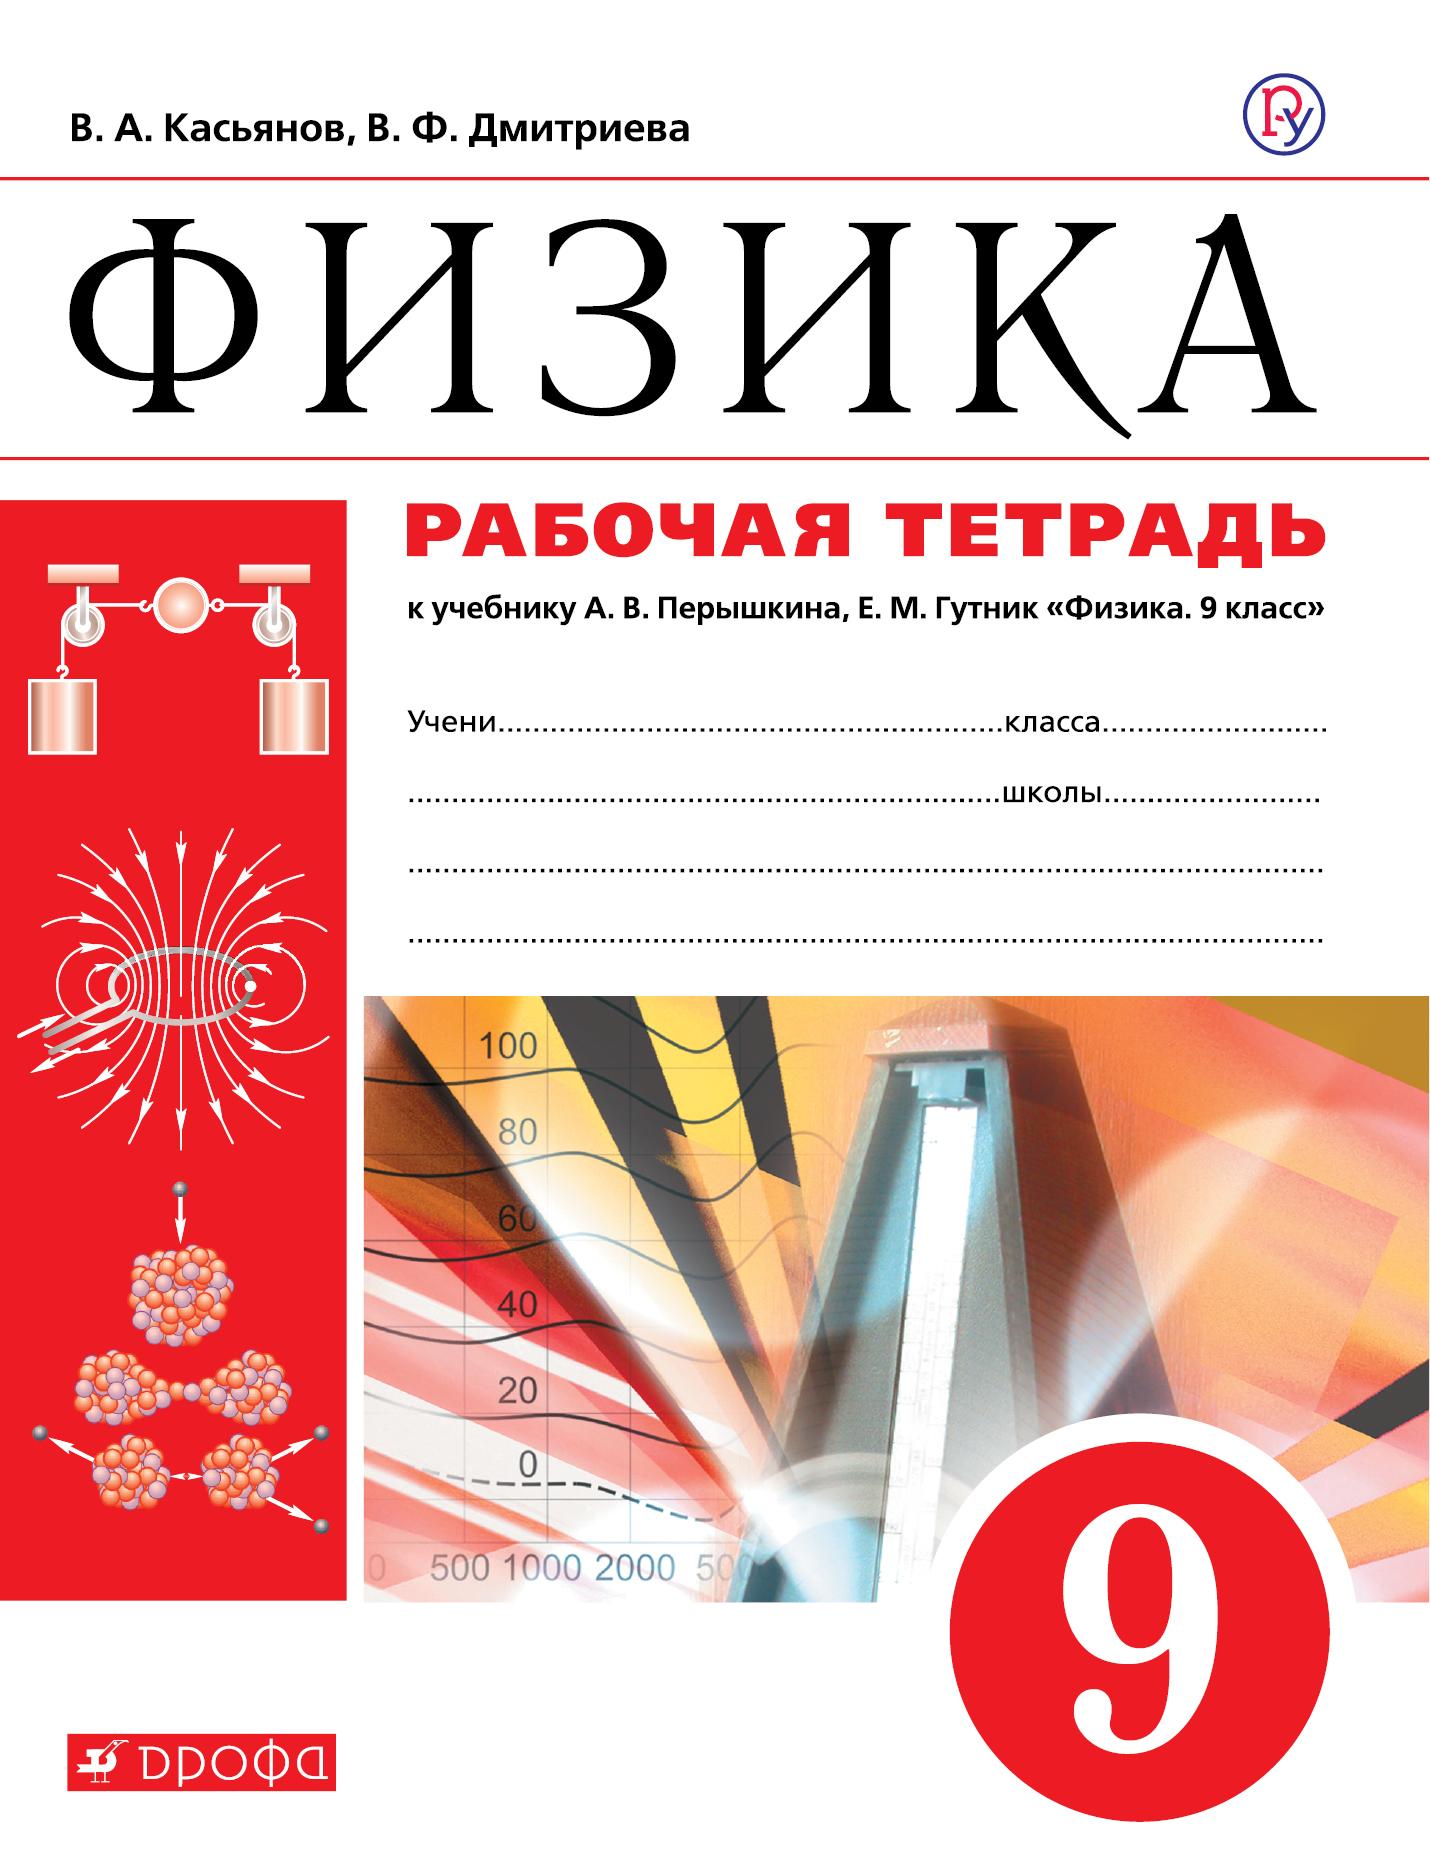 Касьянов В.А., Дмитриева В.Ф. Физика. 9 класс. Рабочая тетрадь. цена